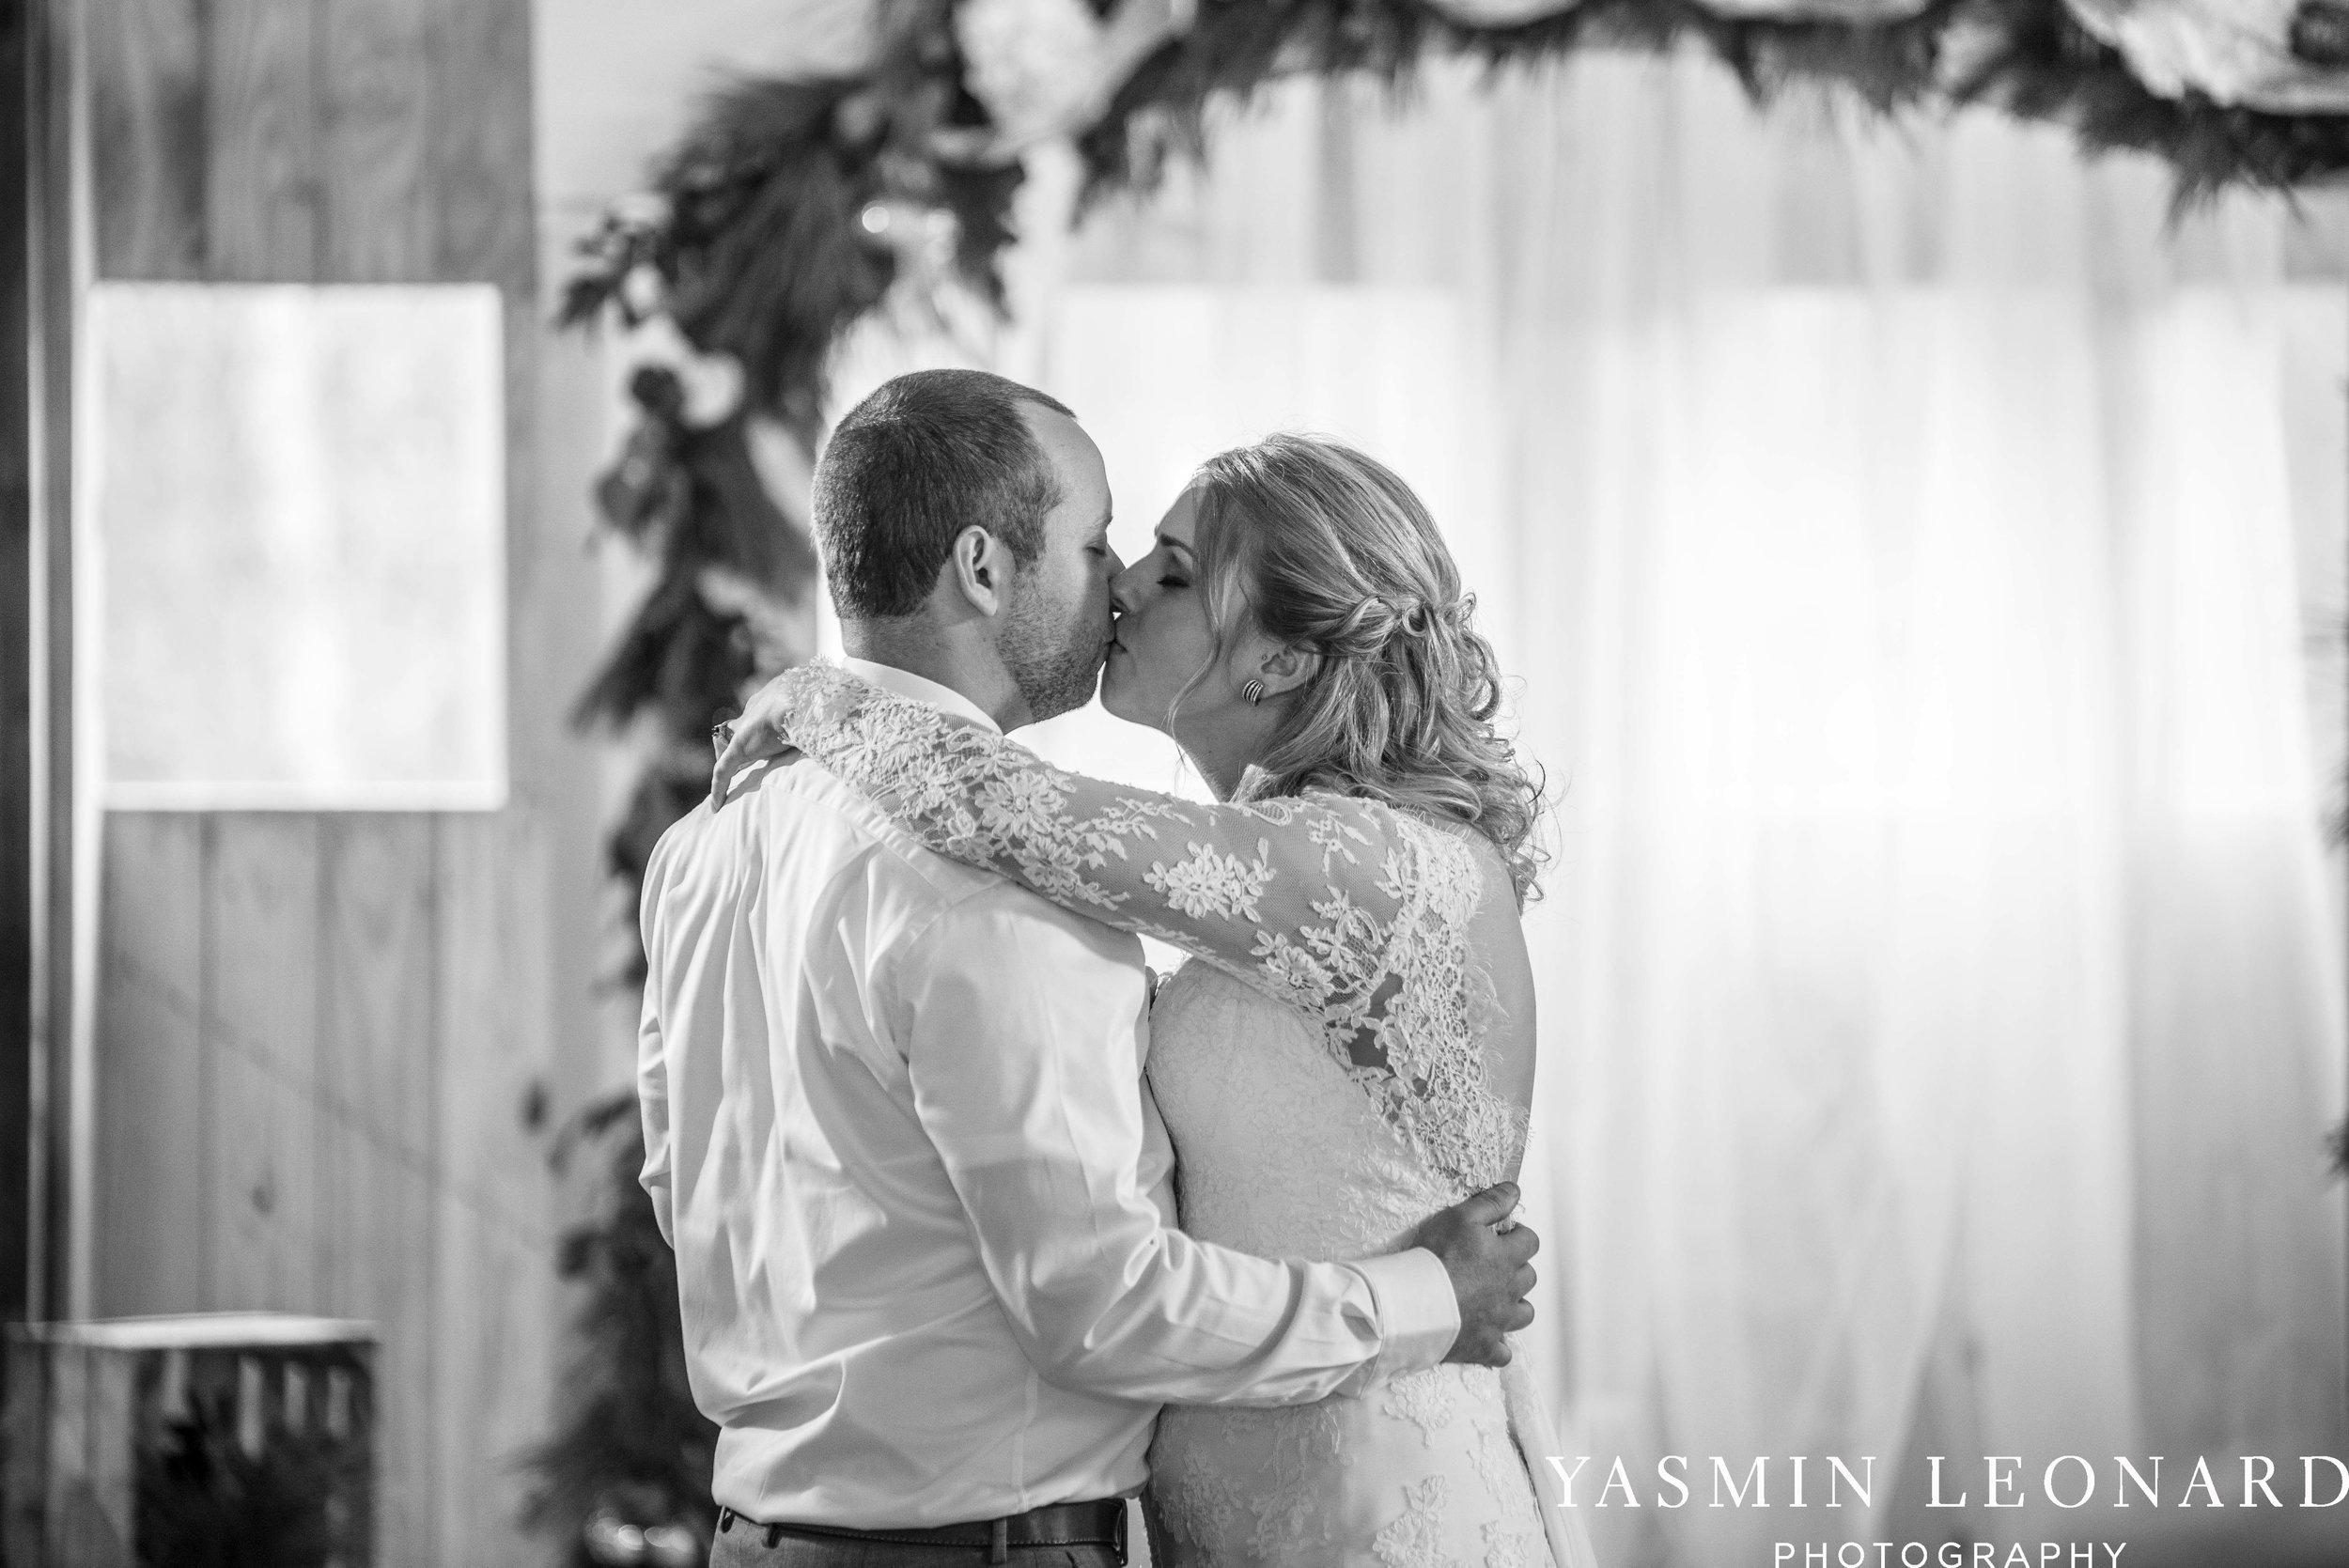 Secret Meadows at Green Dell Farm, NC Barns, NC Wedding Venues, Triad, NC, NC Wedding Photography, Triad Wedding Venues, Affordable Wedding Venues, NEW Wedding Venues, Christmas Weddings-41.jpg